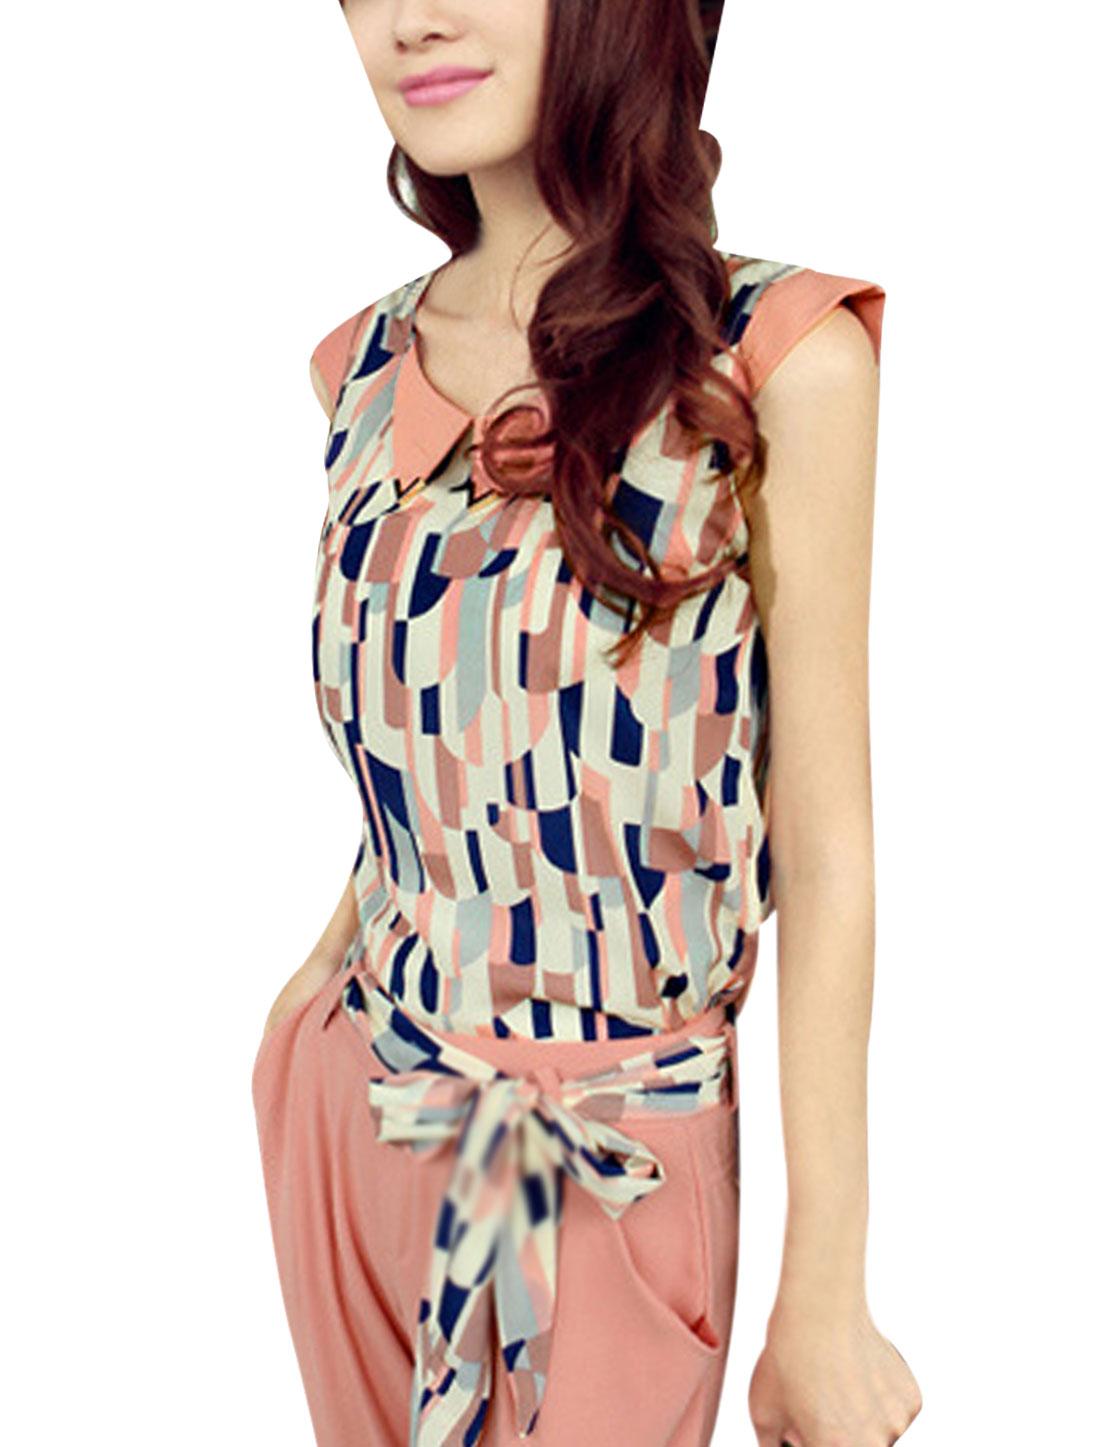 Women Sleeveless Design Round Neck Novelty Pattern Leisure Blouse Pink S